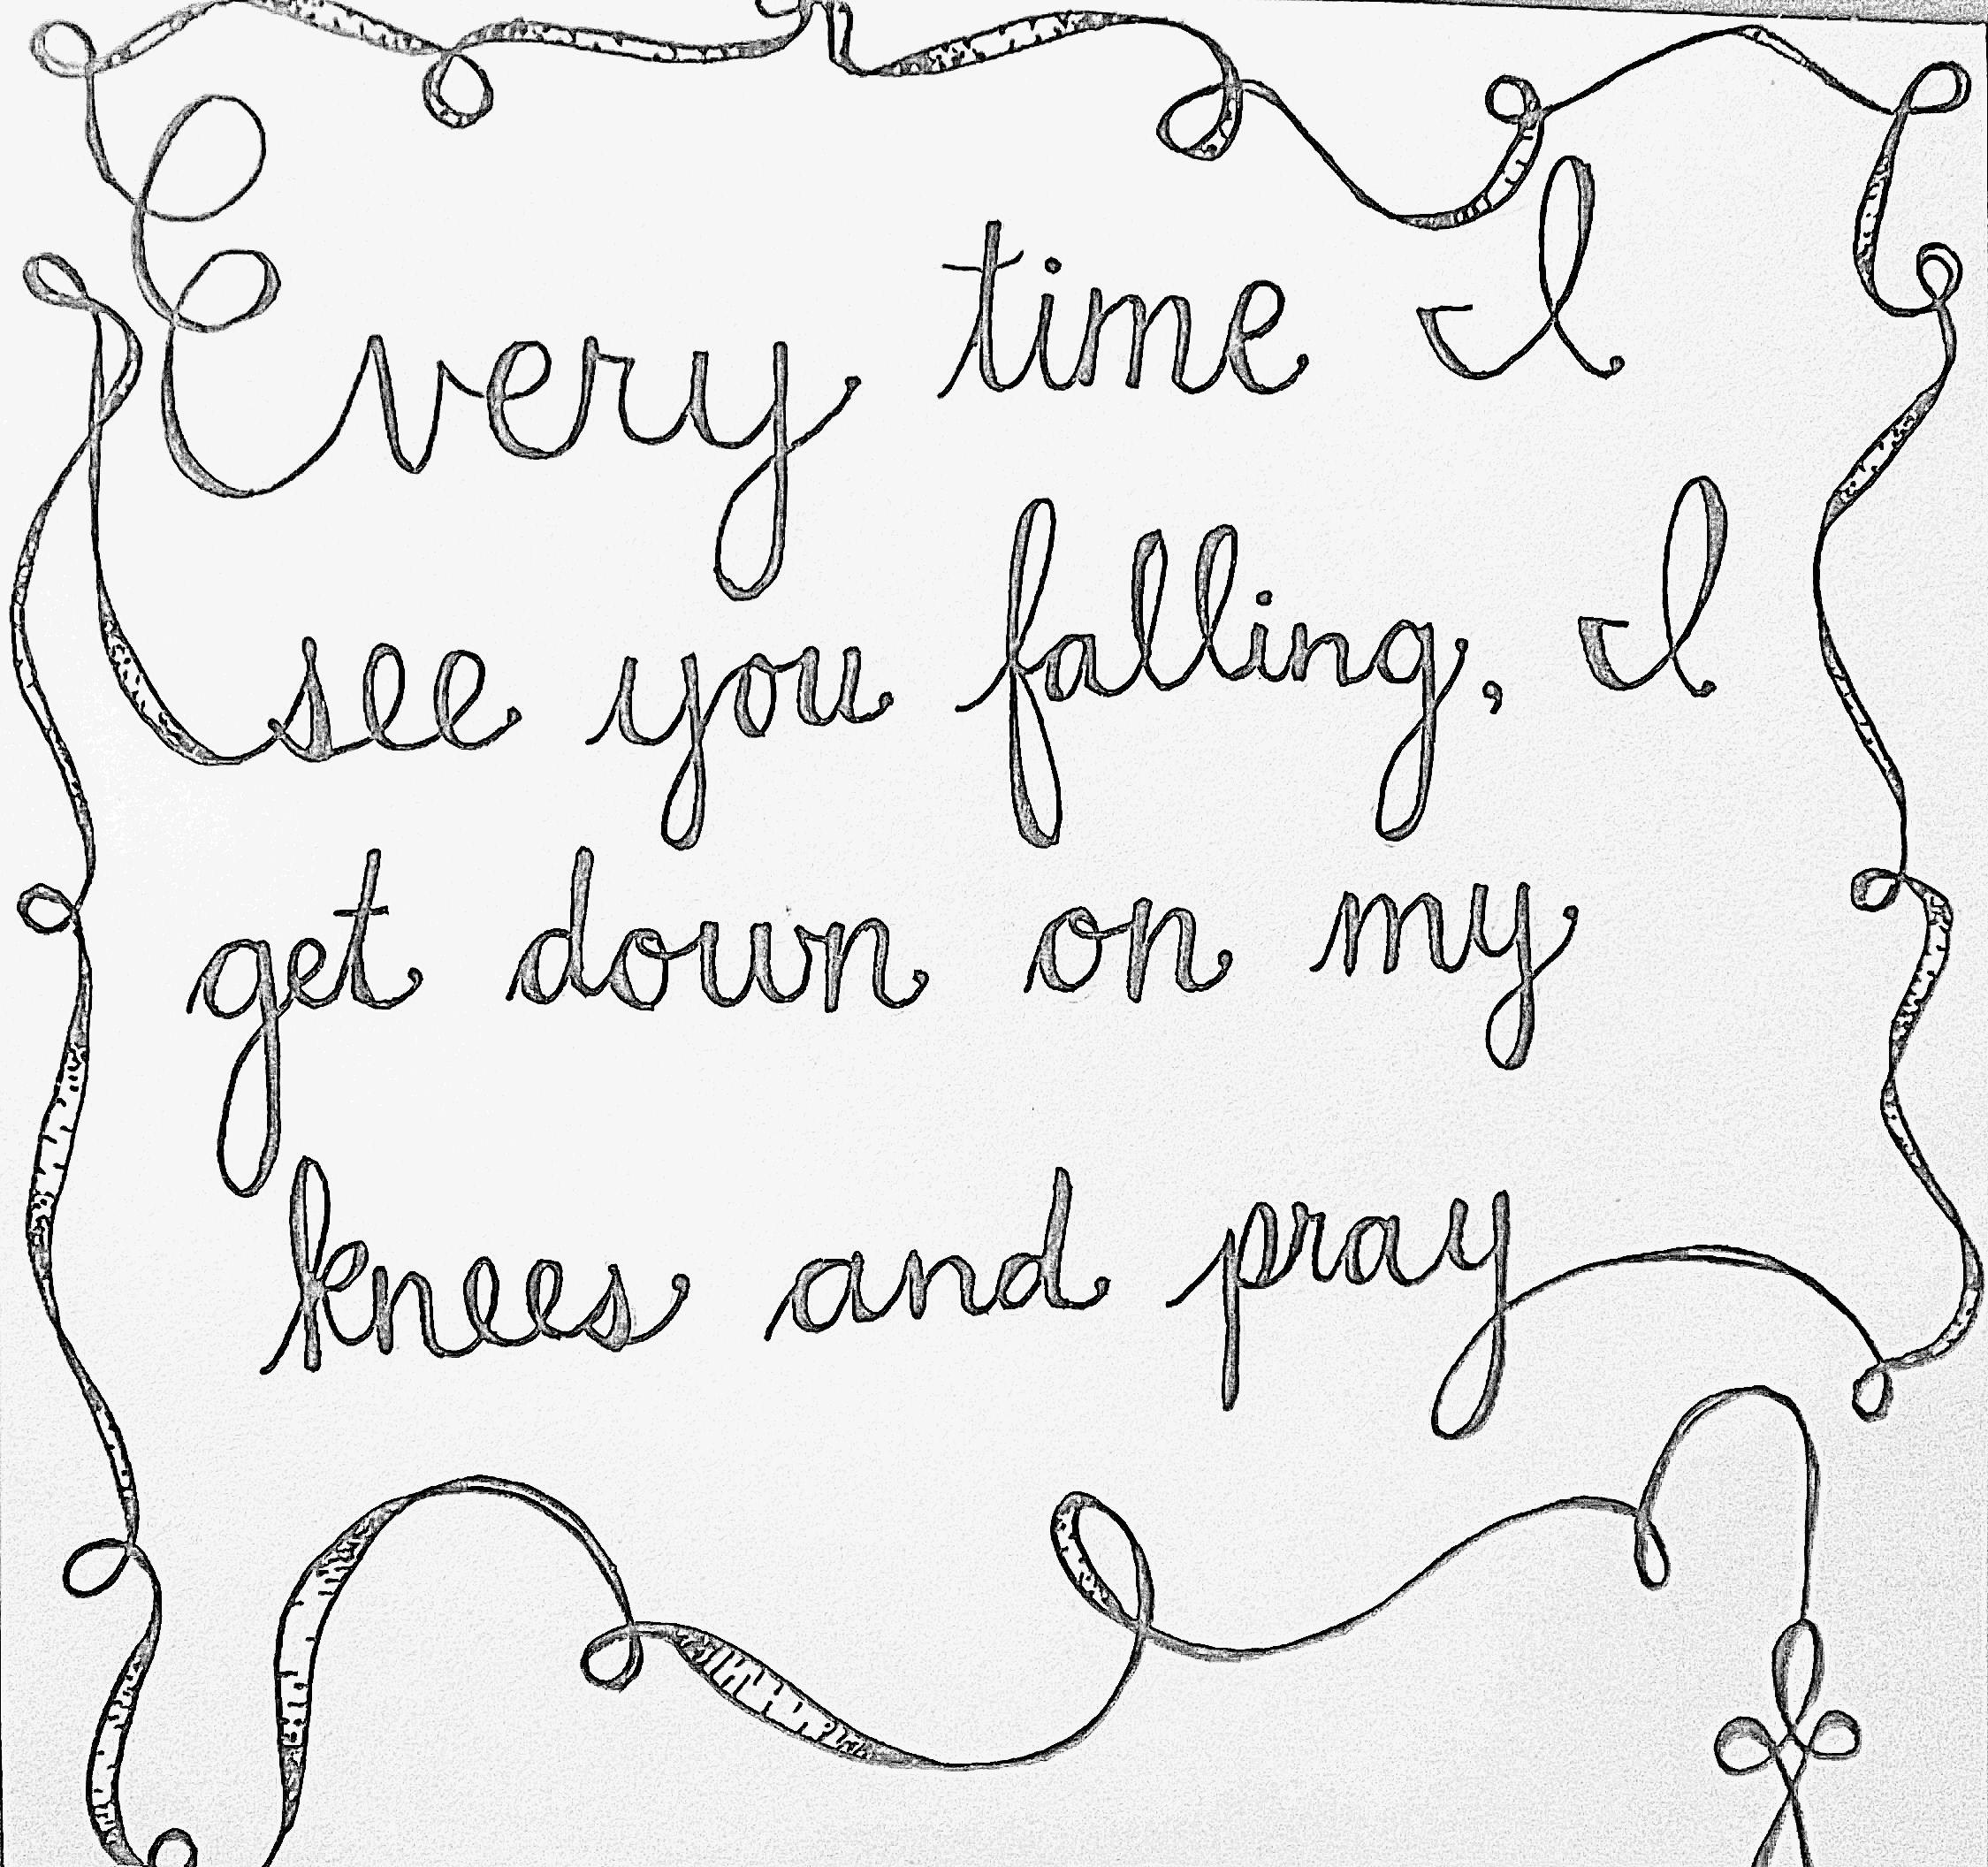 Bizarre Love Triangle Lyrics - YouTube